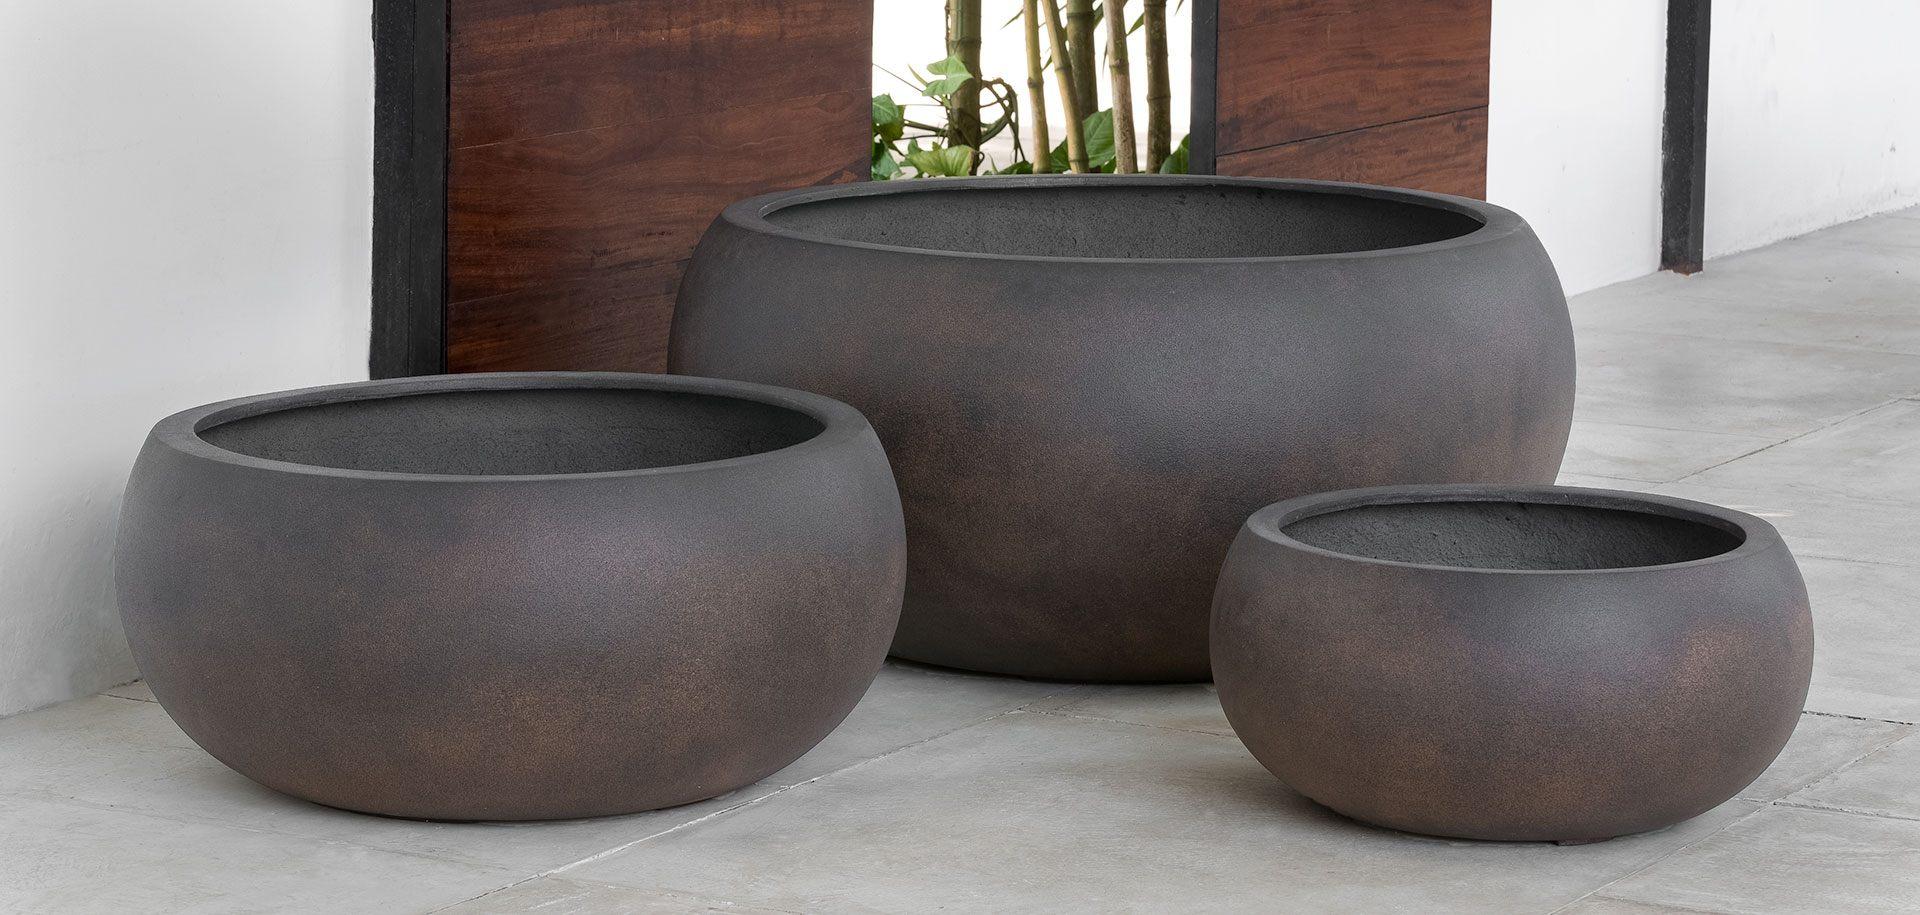 Campania Fiberglass Chalmsworth Bowl Planter Rust Lite All